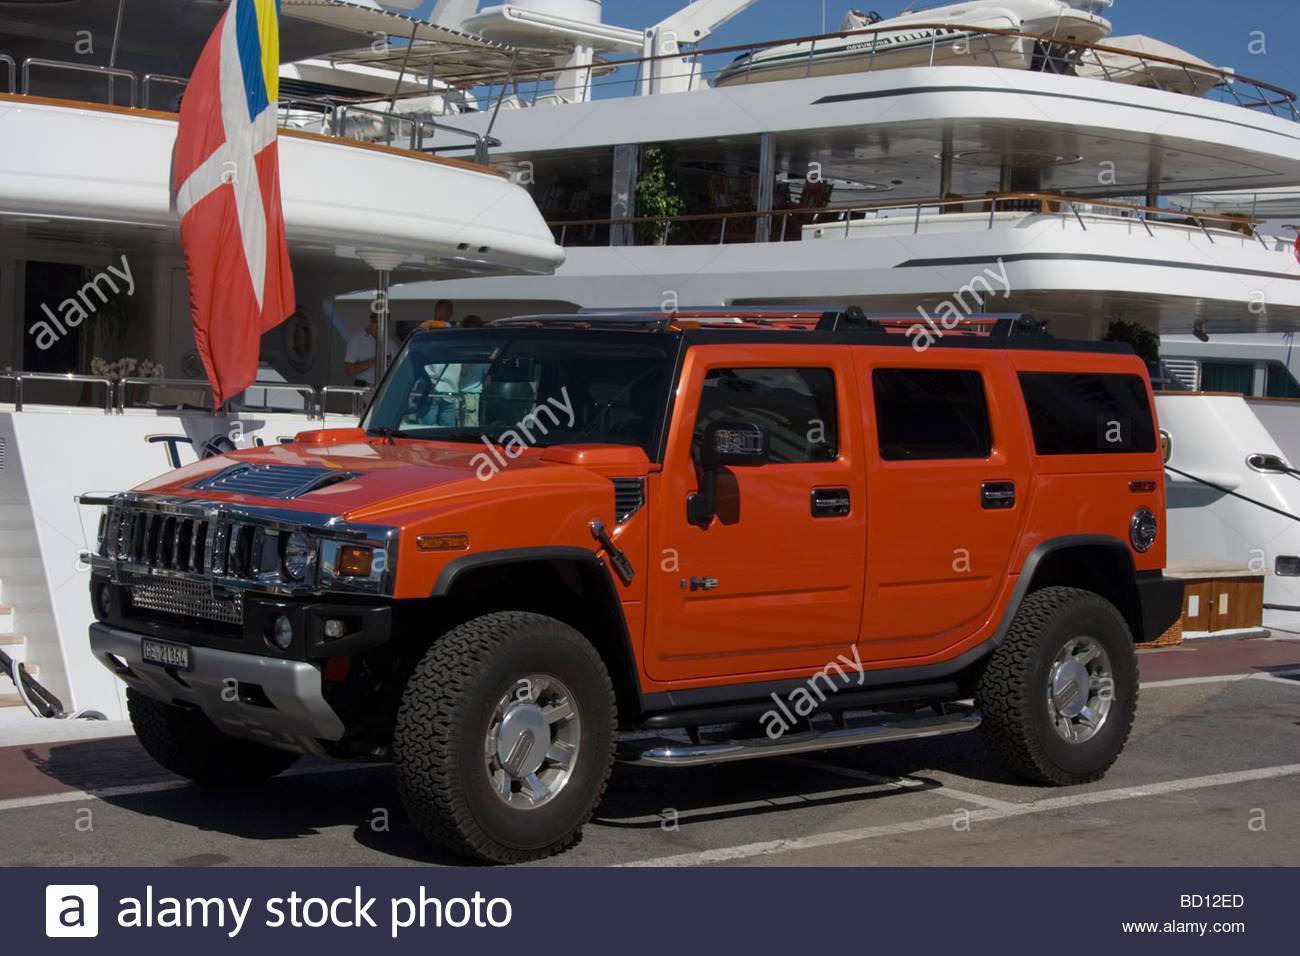 Spain Puerto Banus Hummer and Luxury yachts - Stock Image